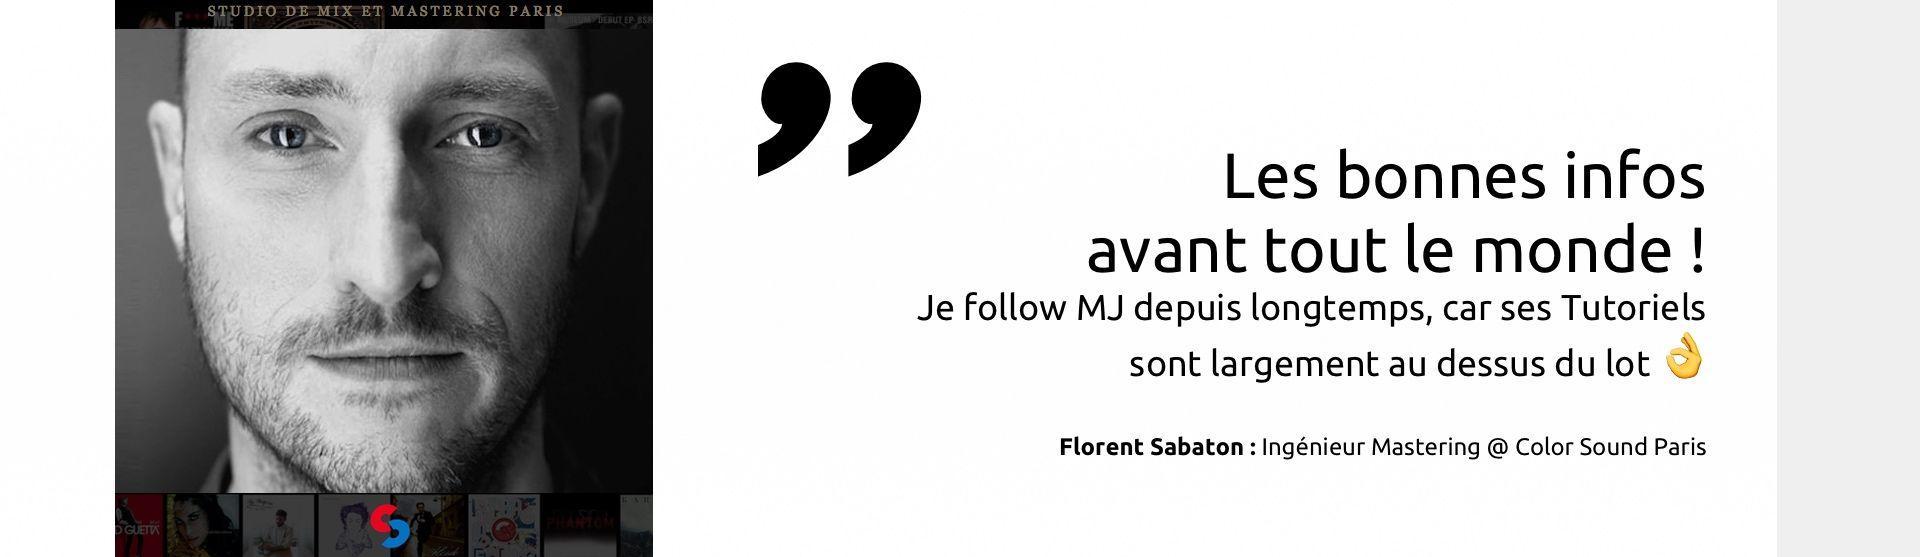 Florent Sabaton recommande MJ Tutoriels<span></span>